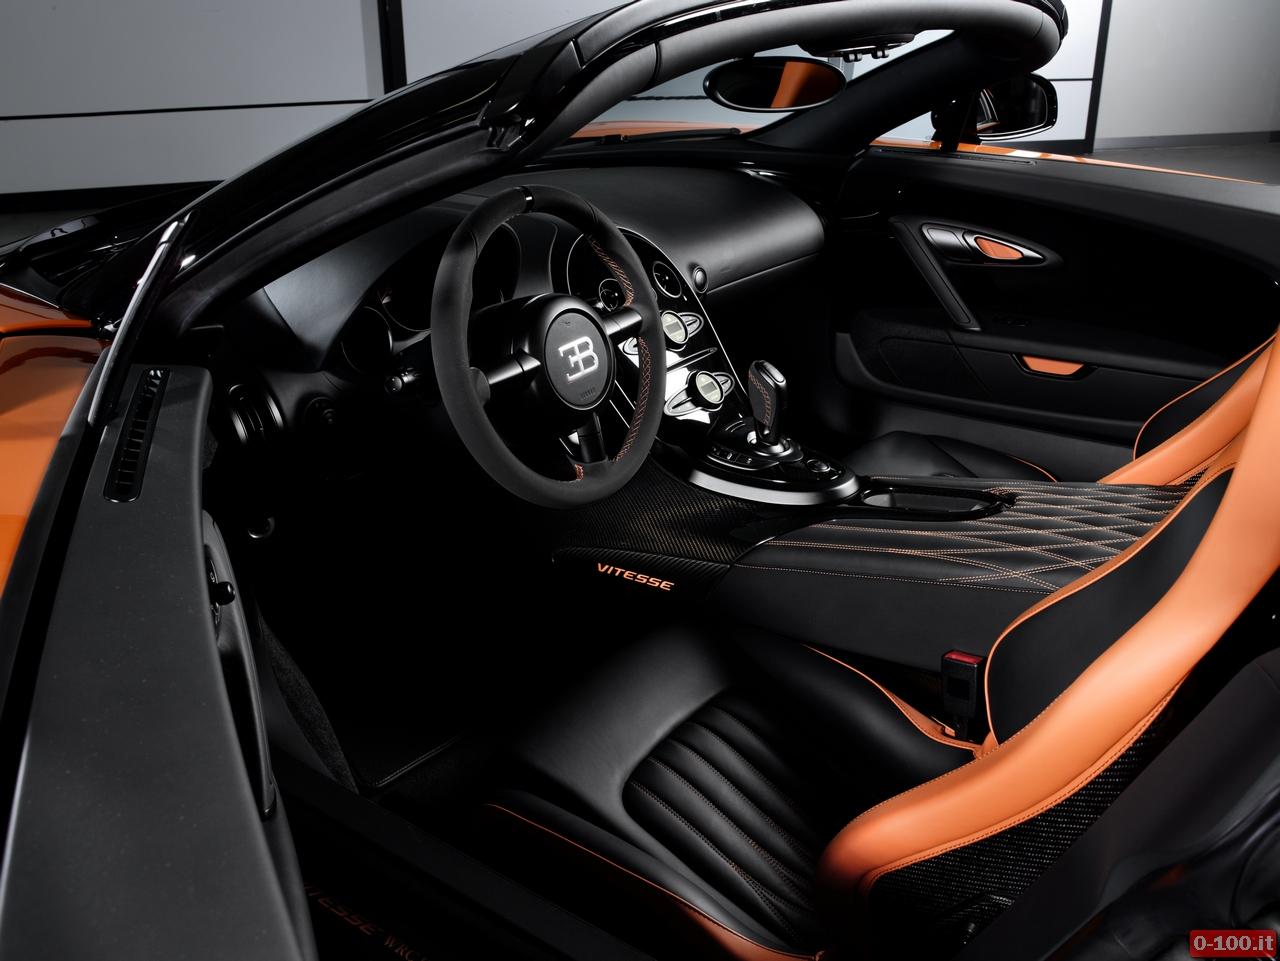 bugatti-veyron-16-4-grand-sport-vitesse-debutto-a-shanghai_0-100_9